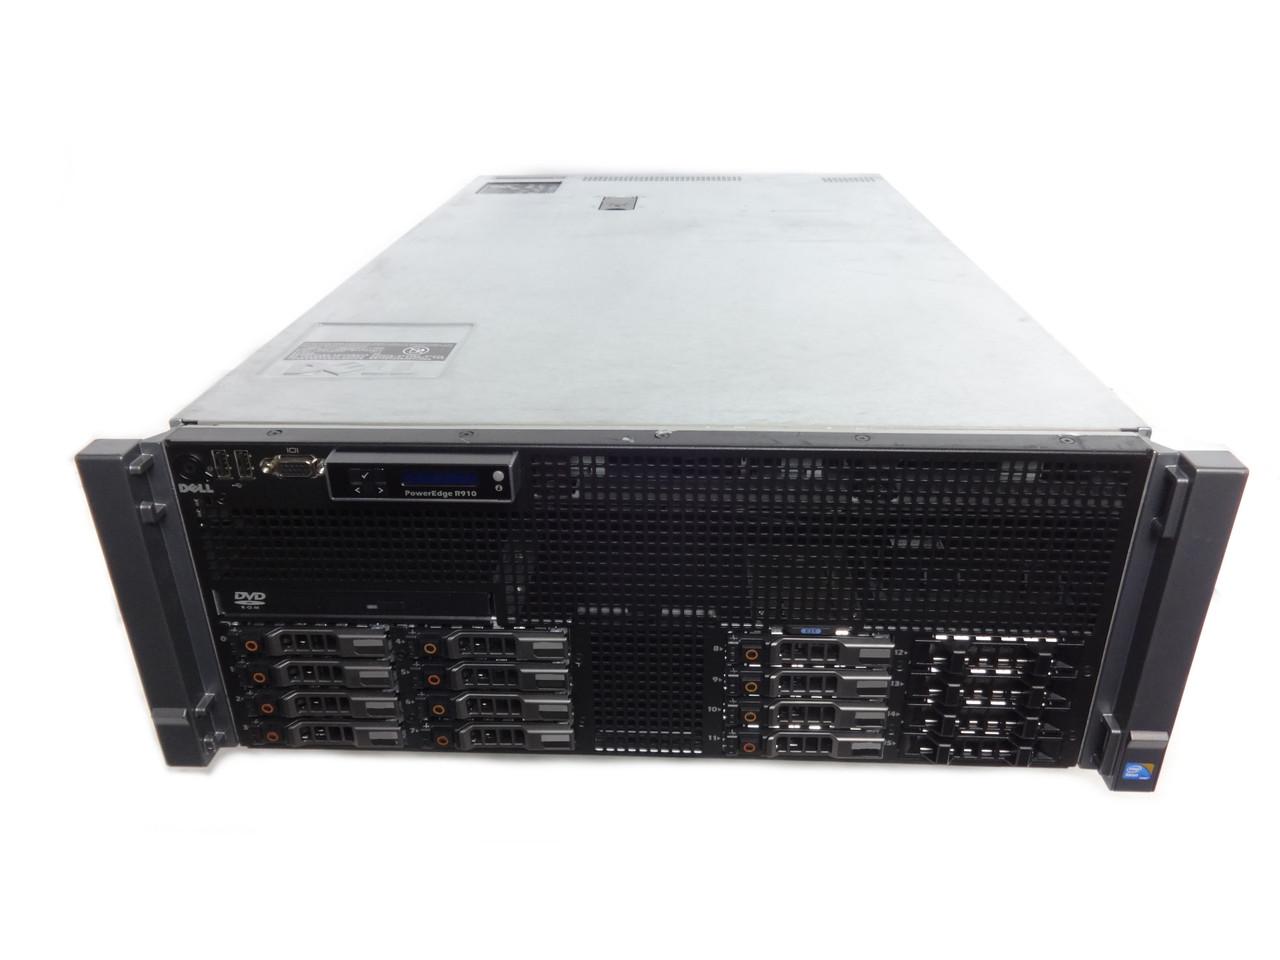 Poweredge R910 Server